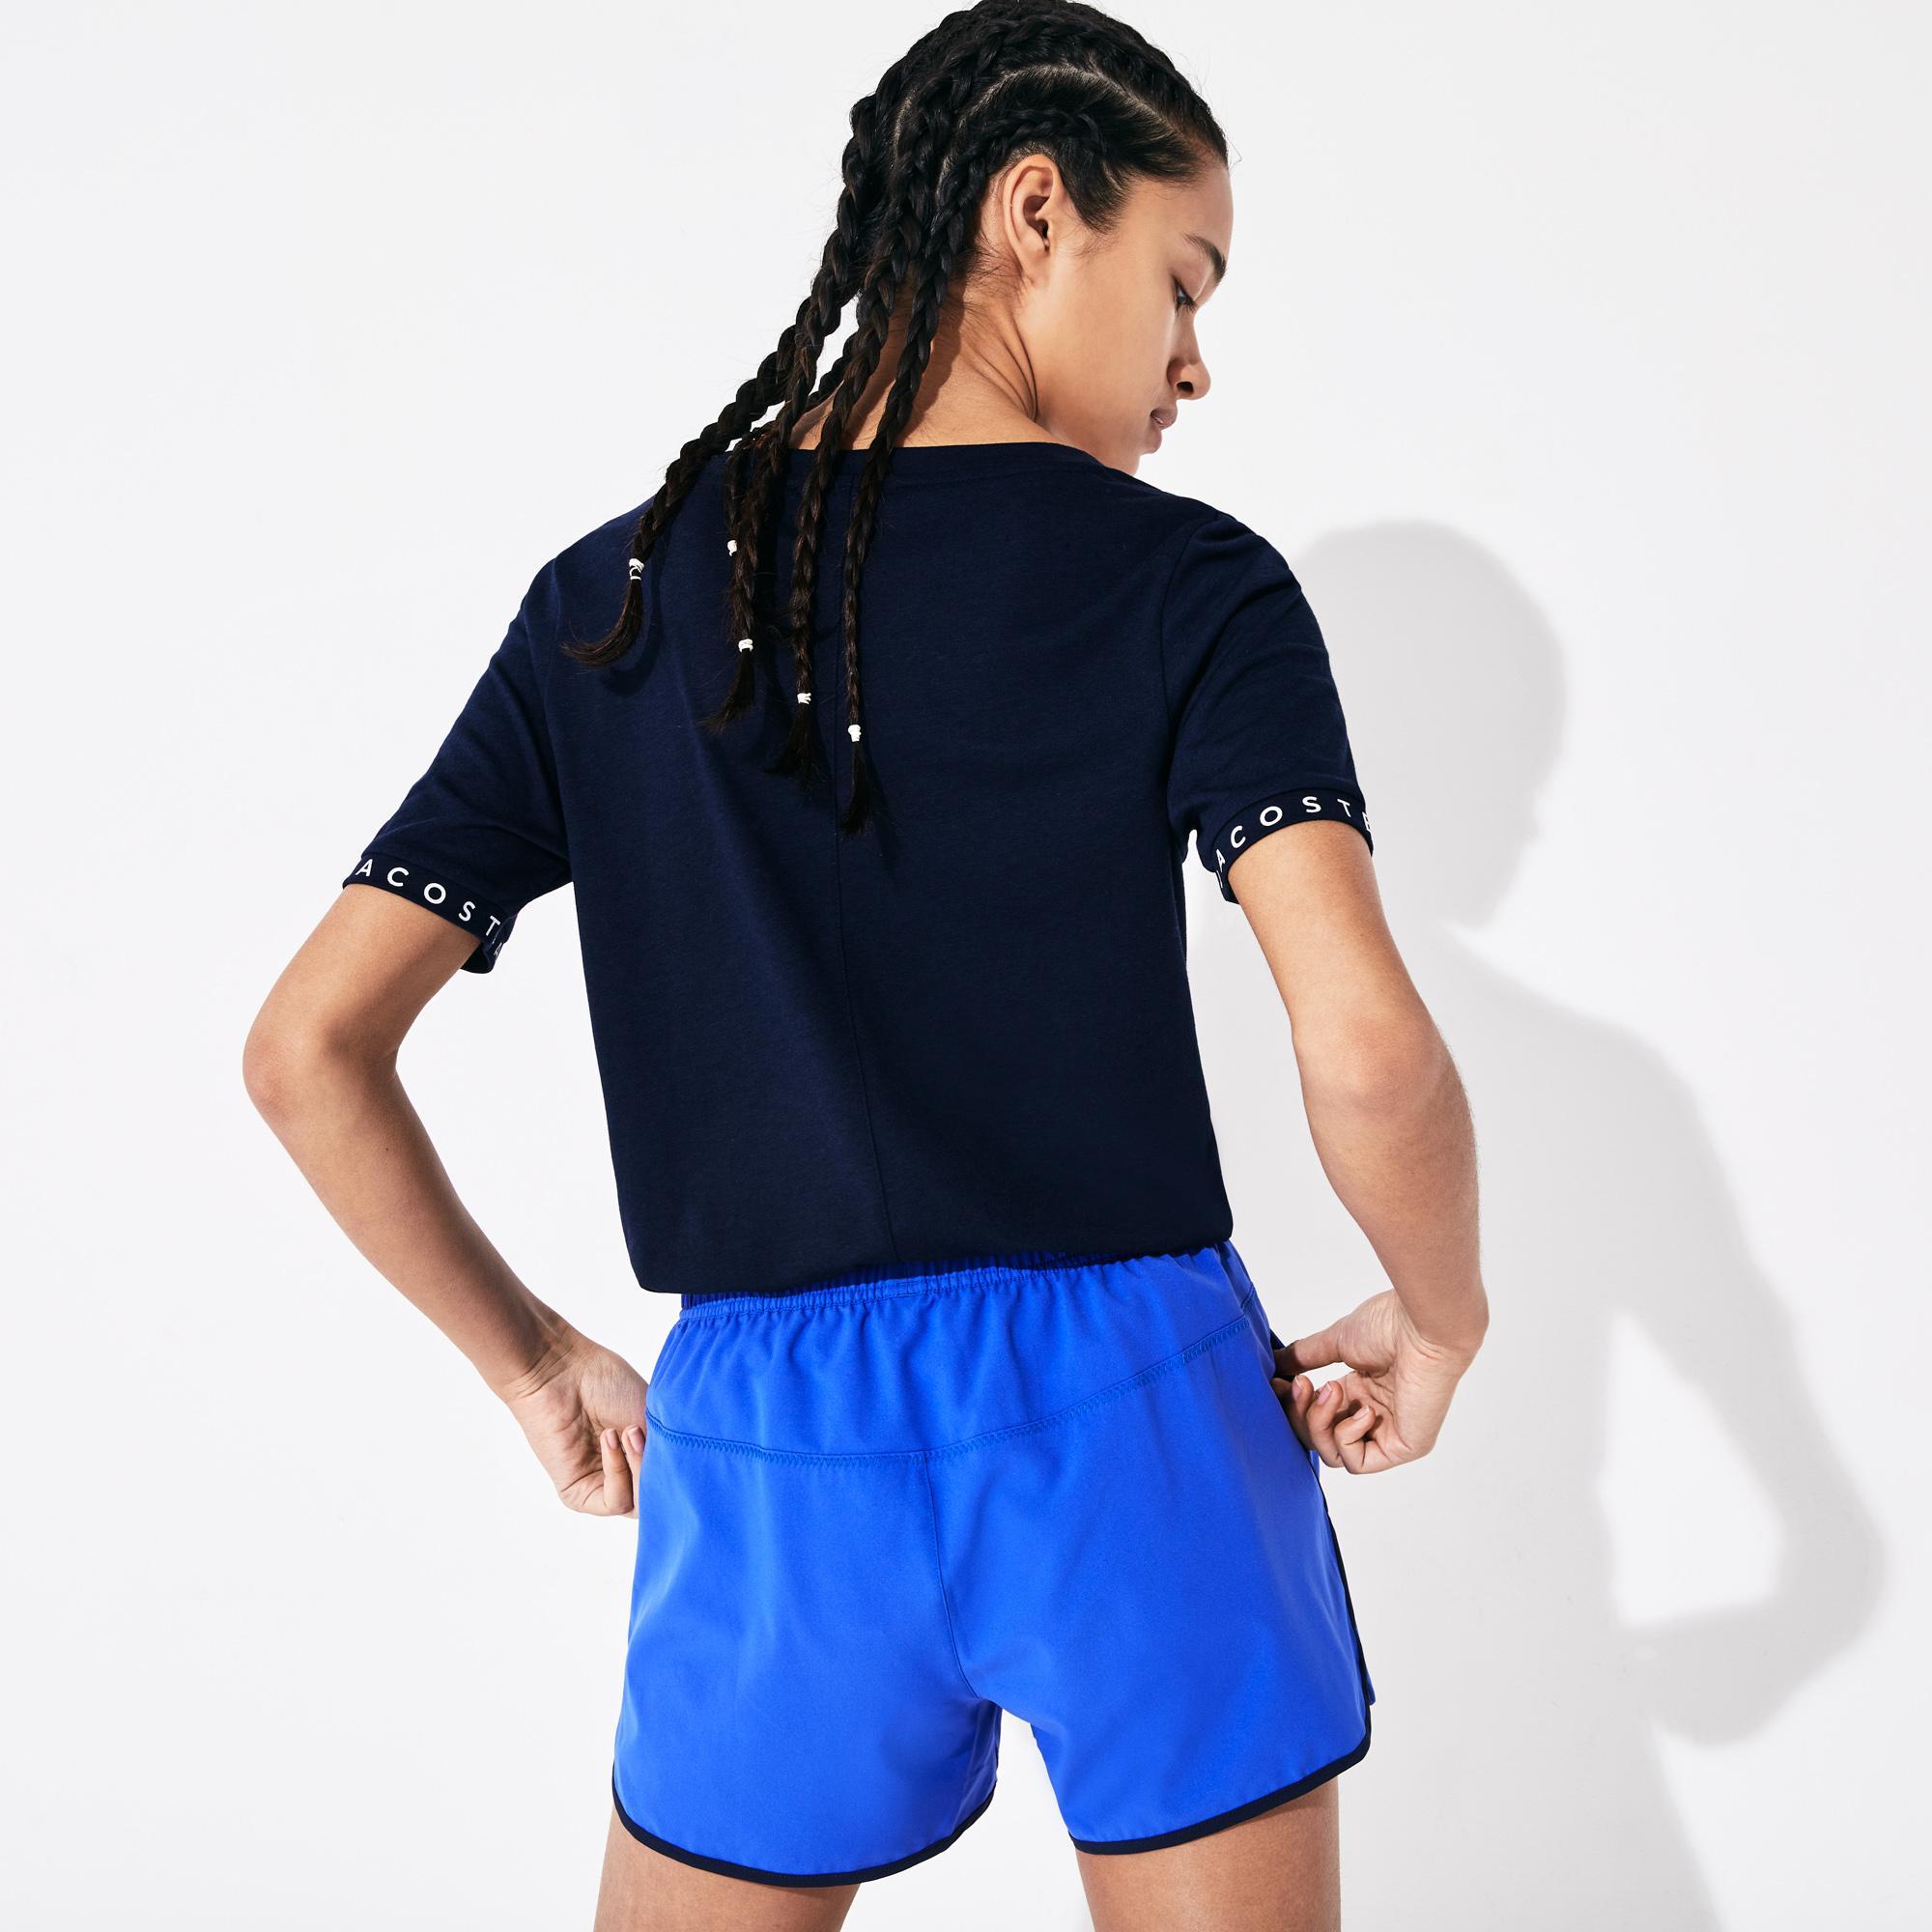 Lacoste Women's Sport Flowing Lettered Sleeve Tennis T-Shirt